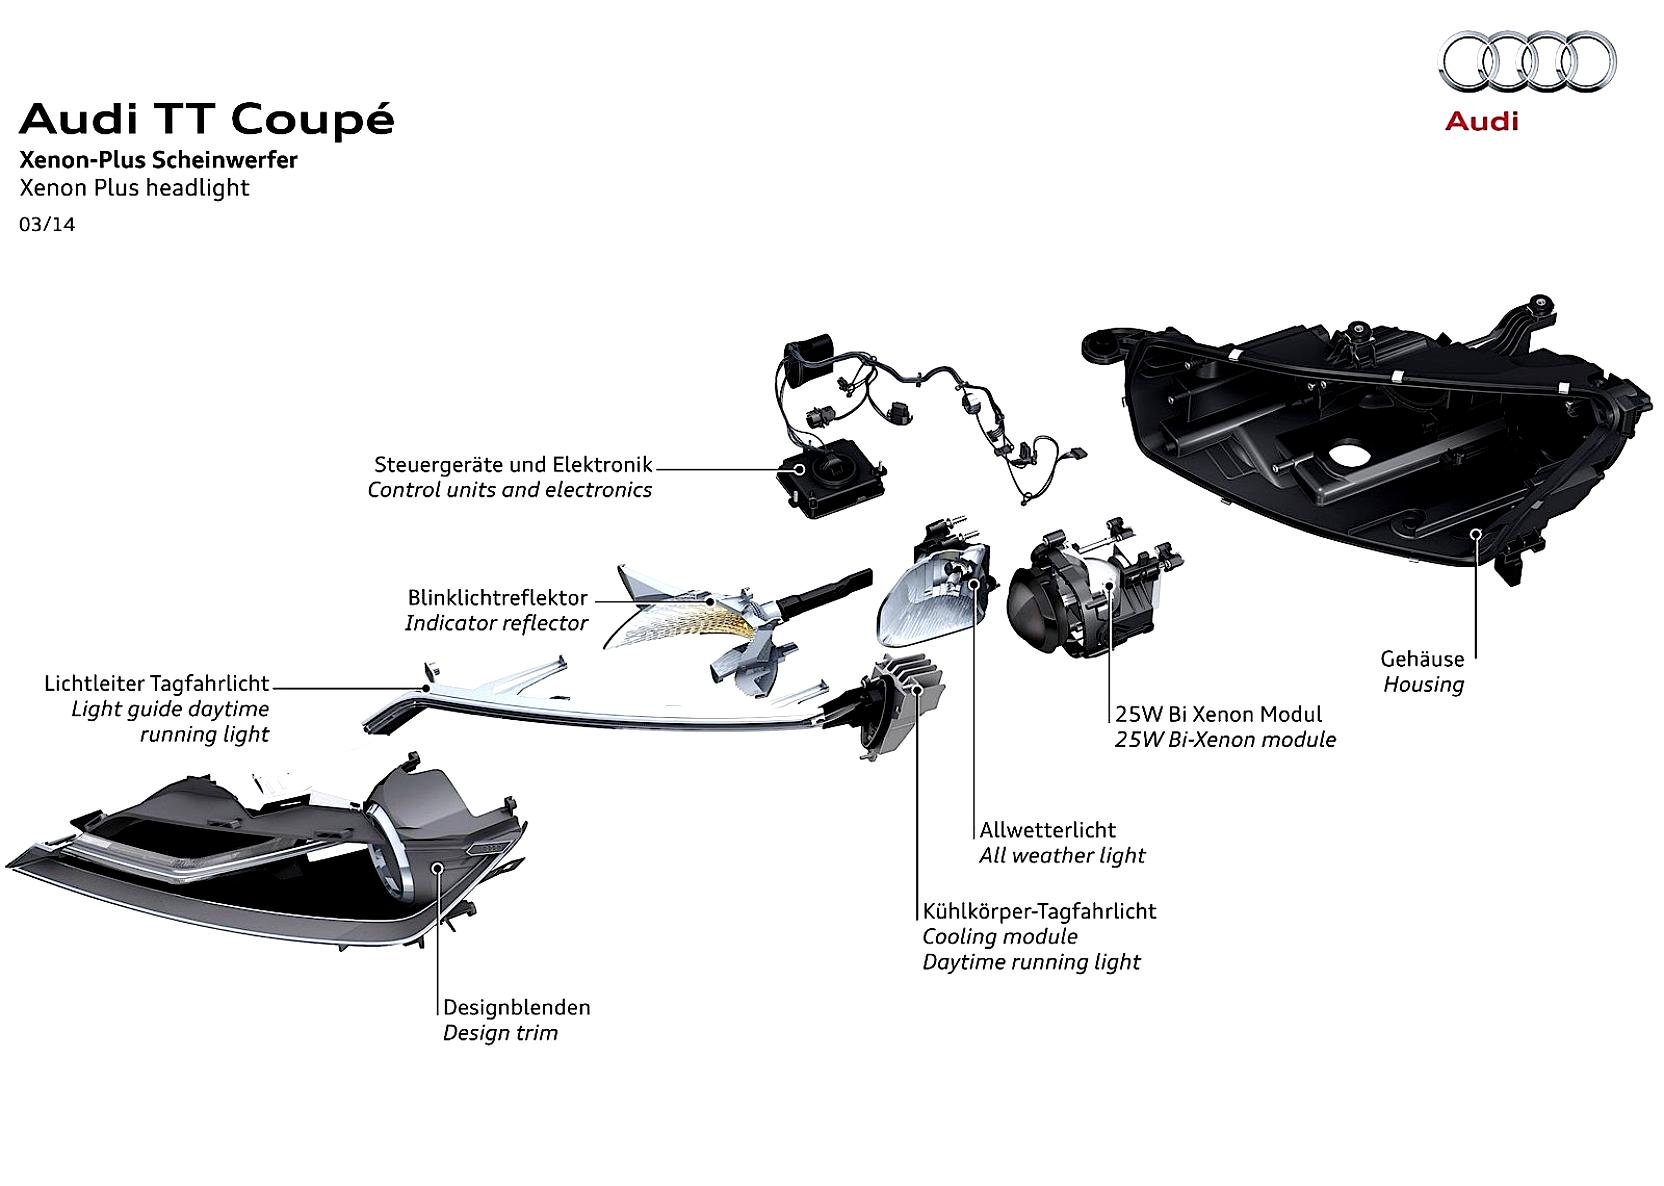 Audi TT 2014 on MotoImg.com